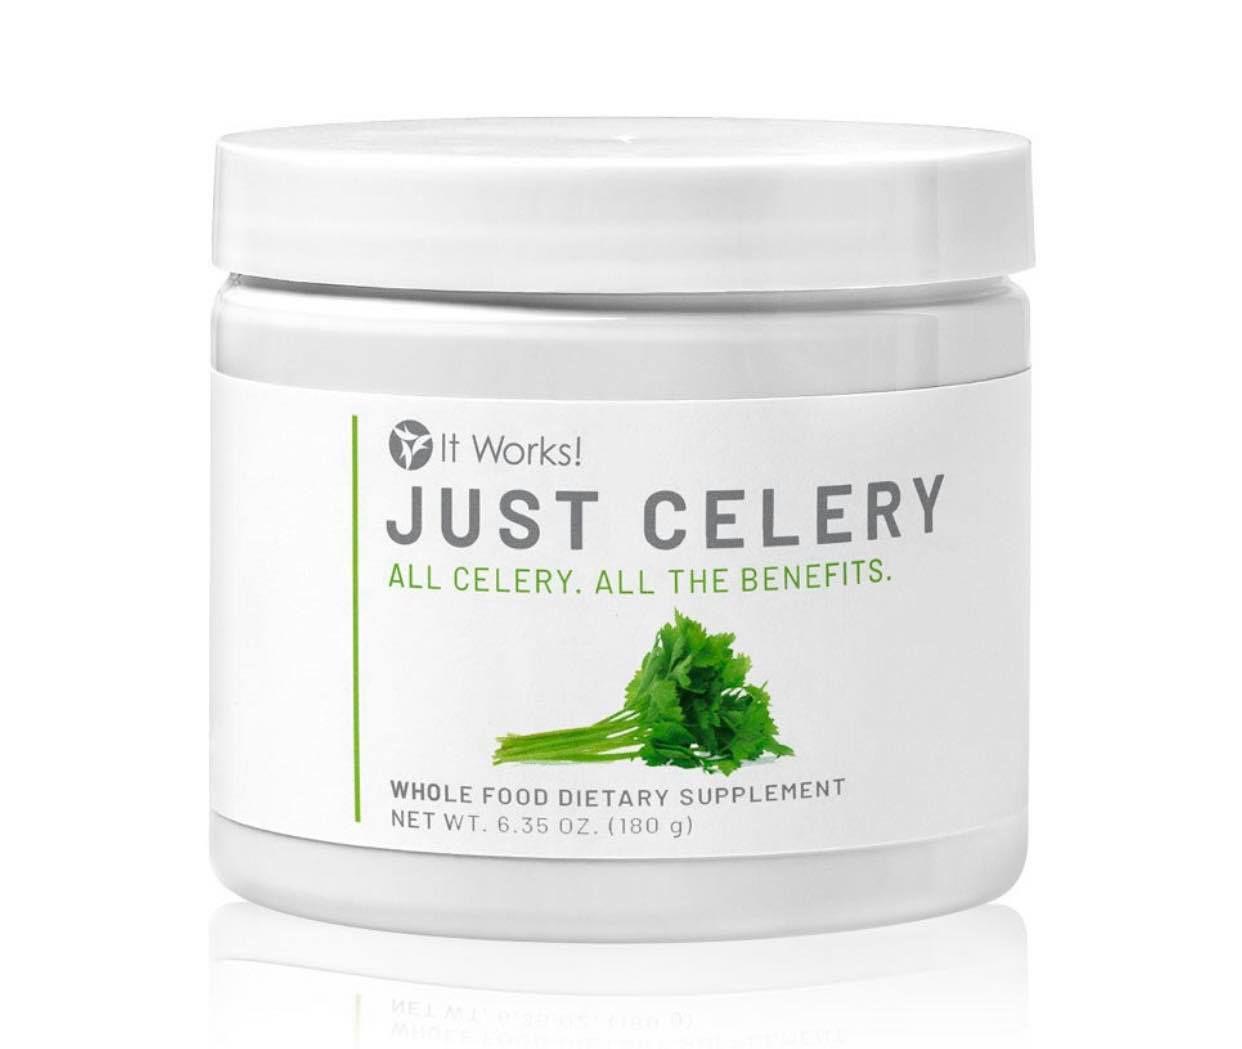 Celery jar